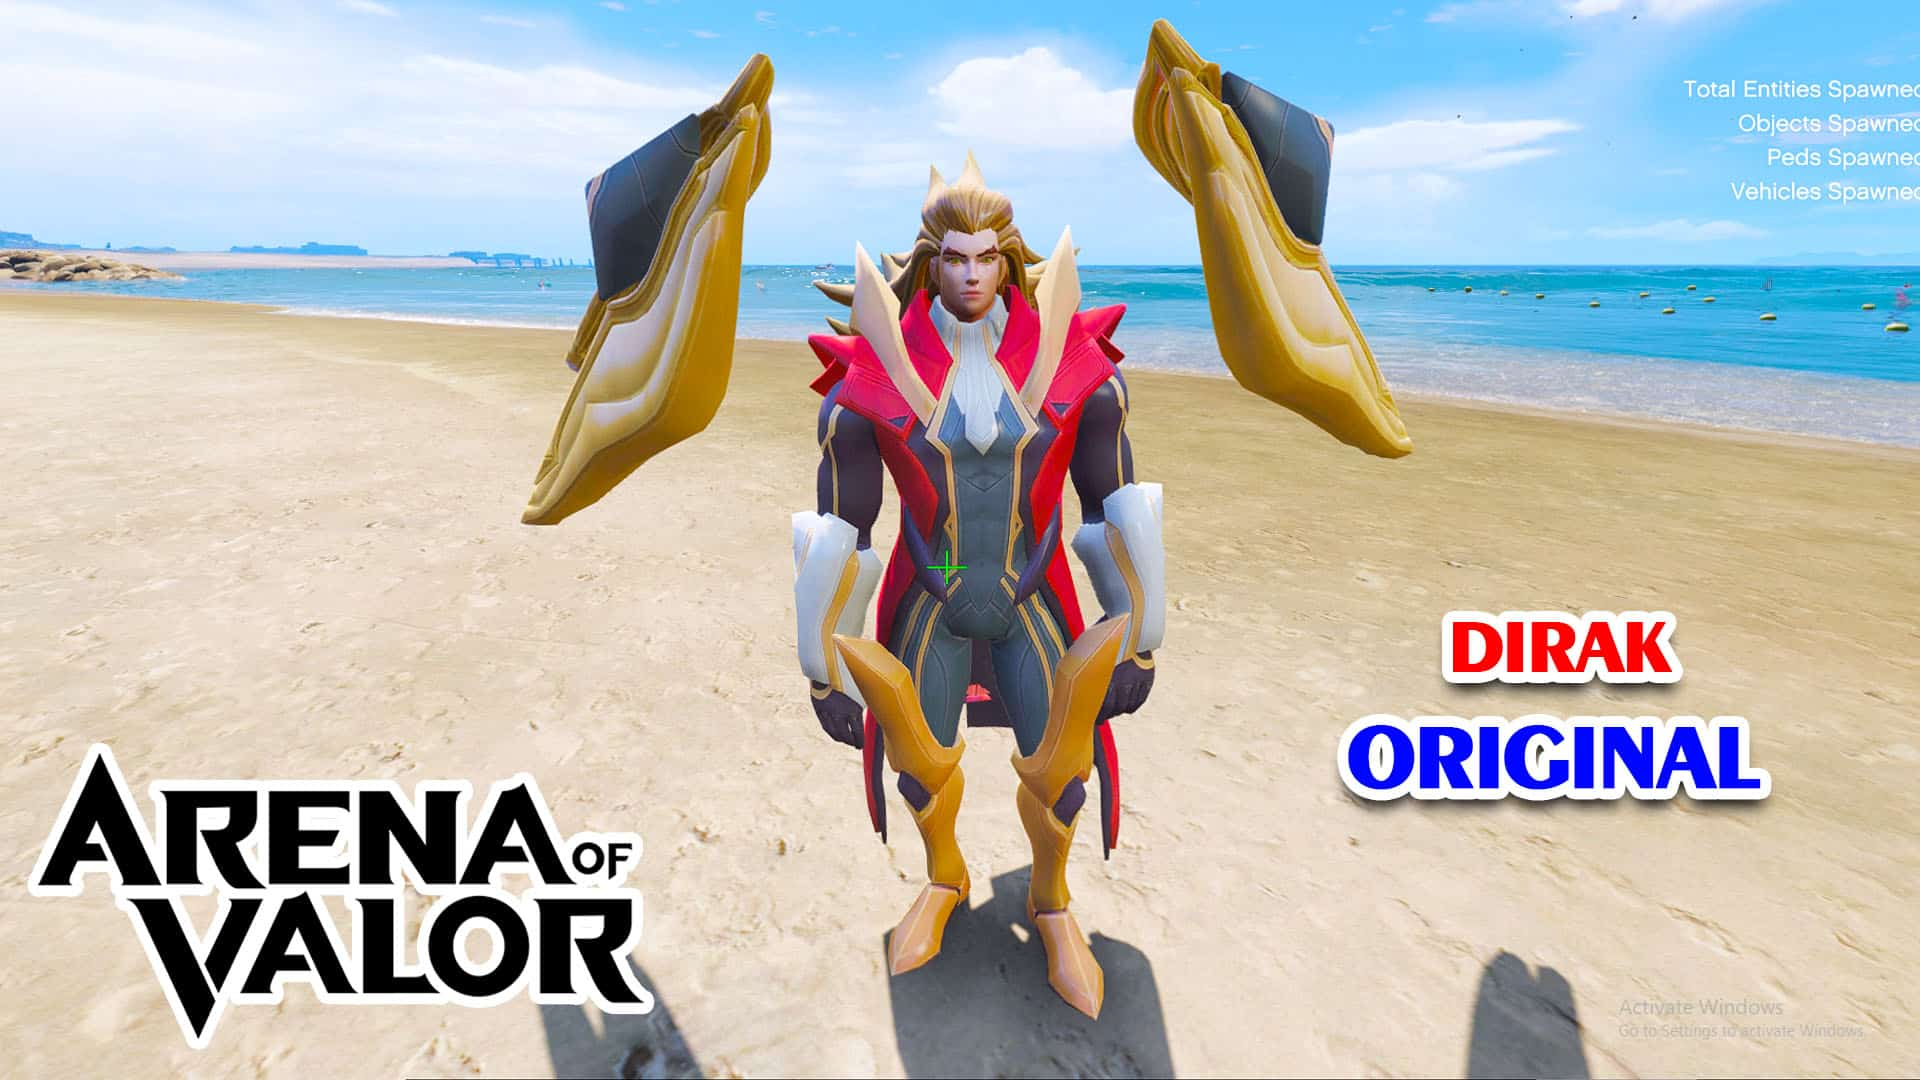 GTA 5 Mod Dirak Original Arena of Valor